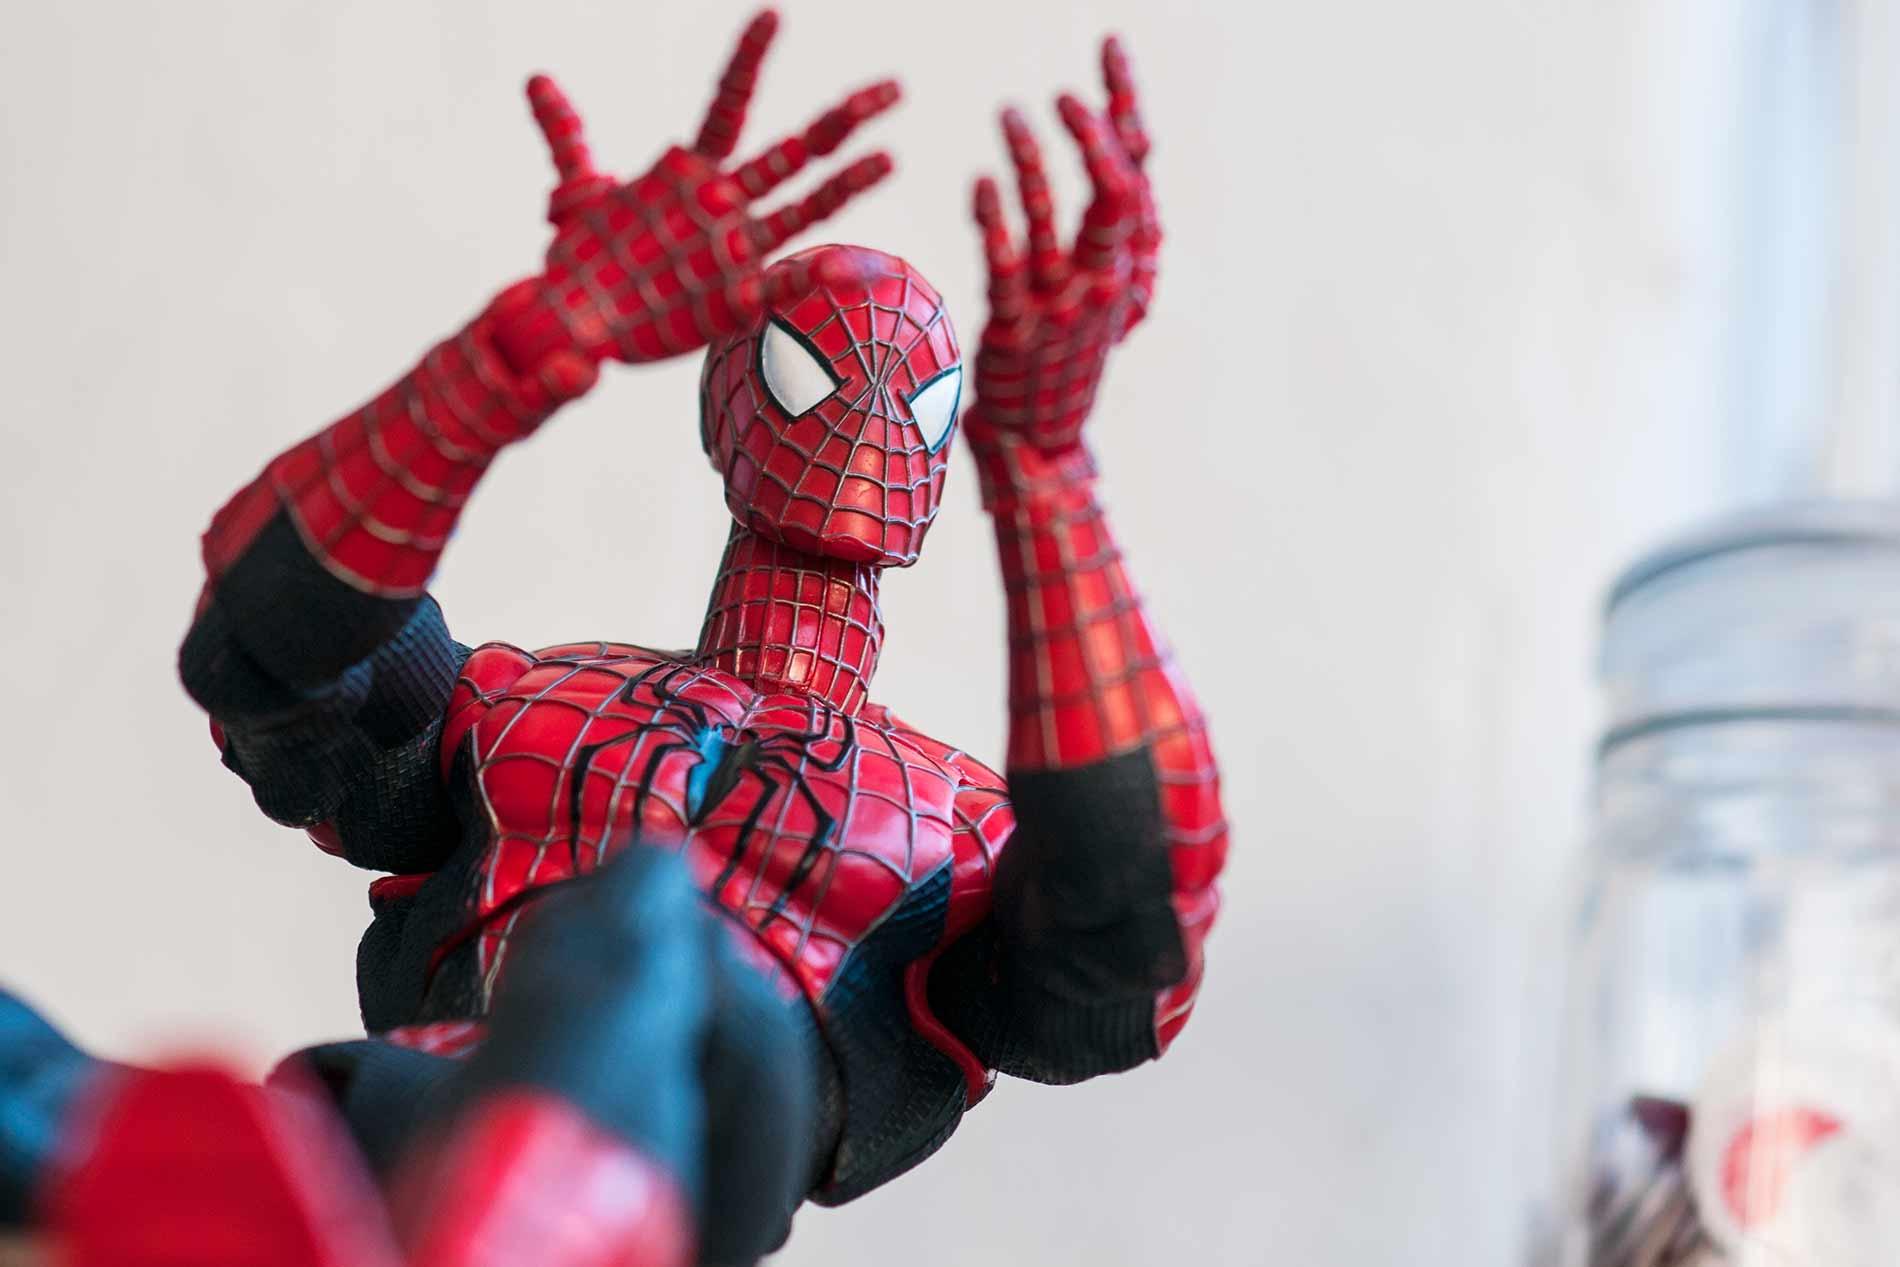 Janina-Lermer-Chief-Inspiration-Office-Spiderman